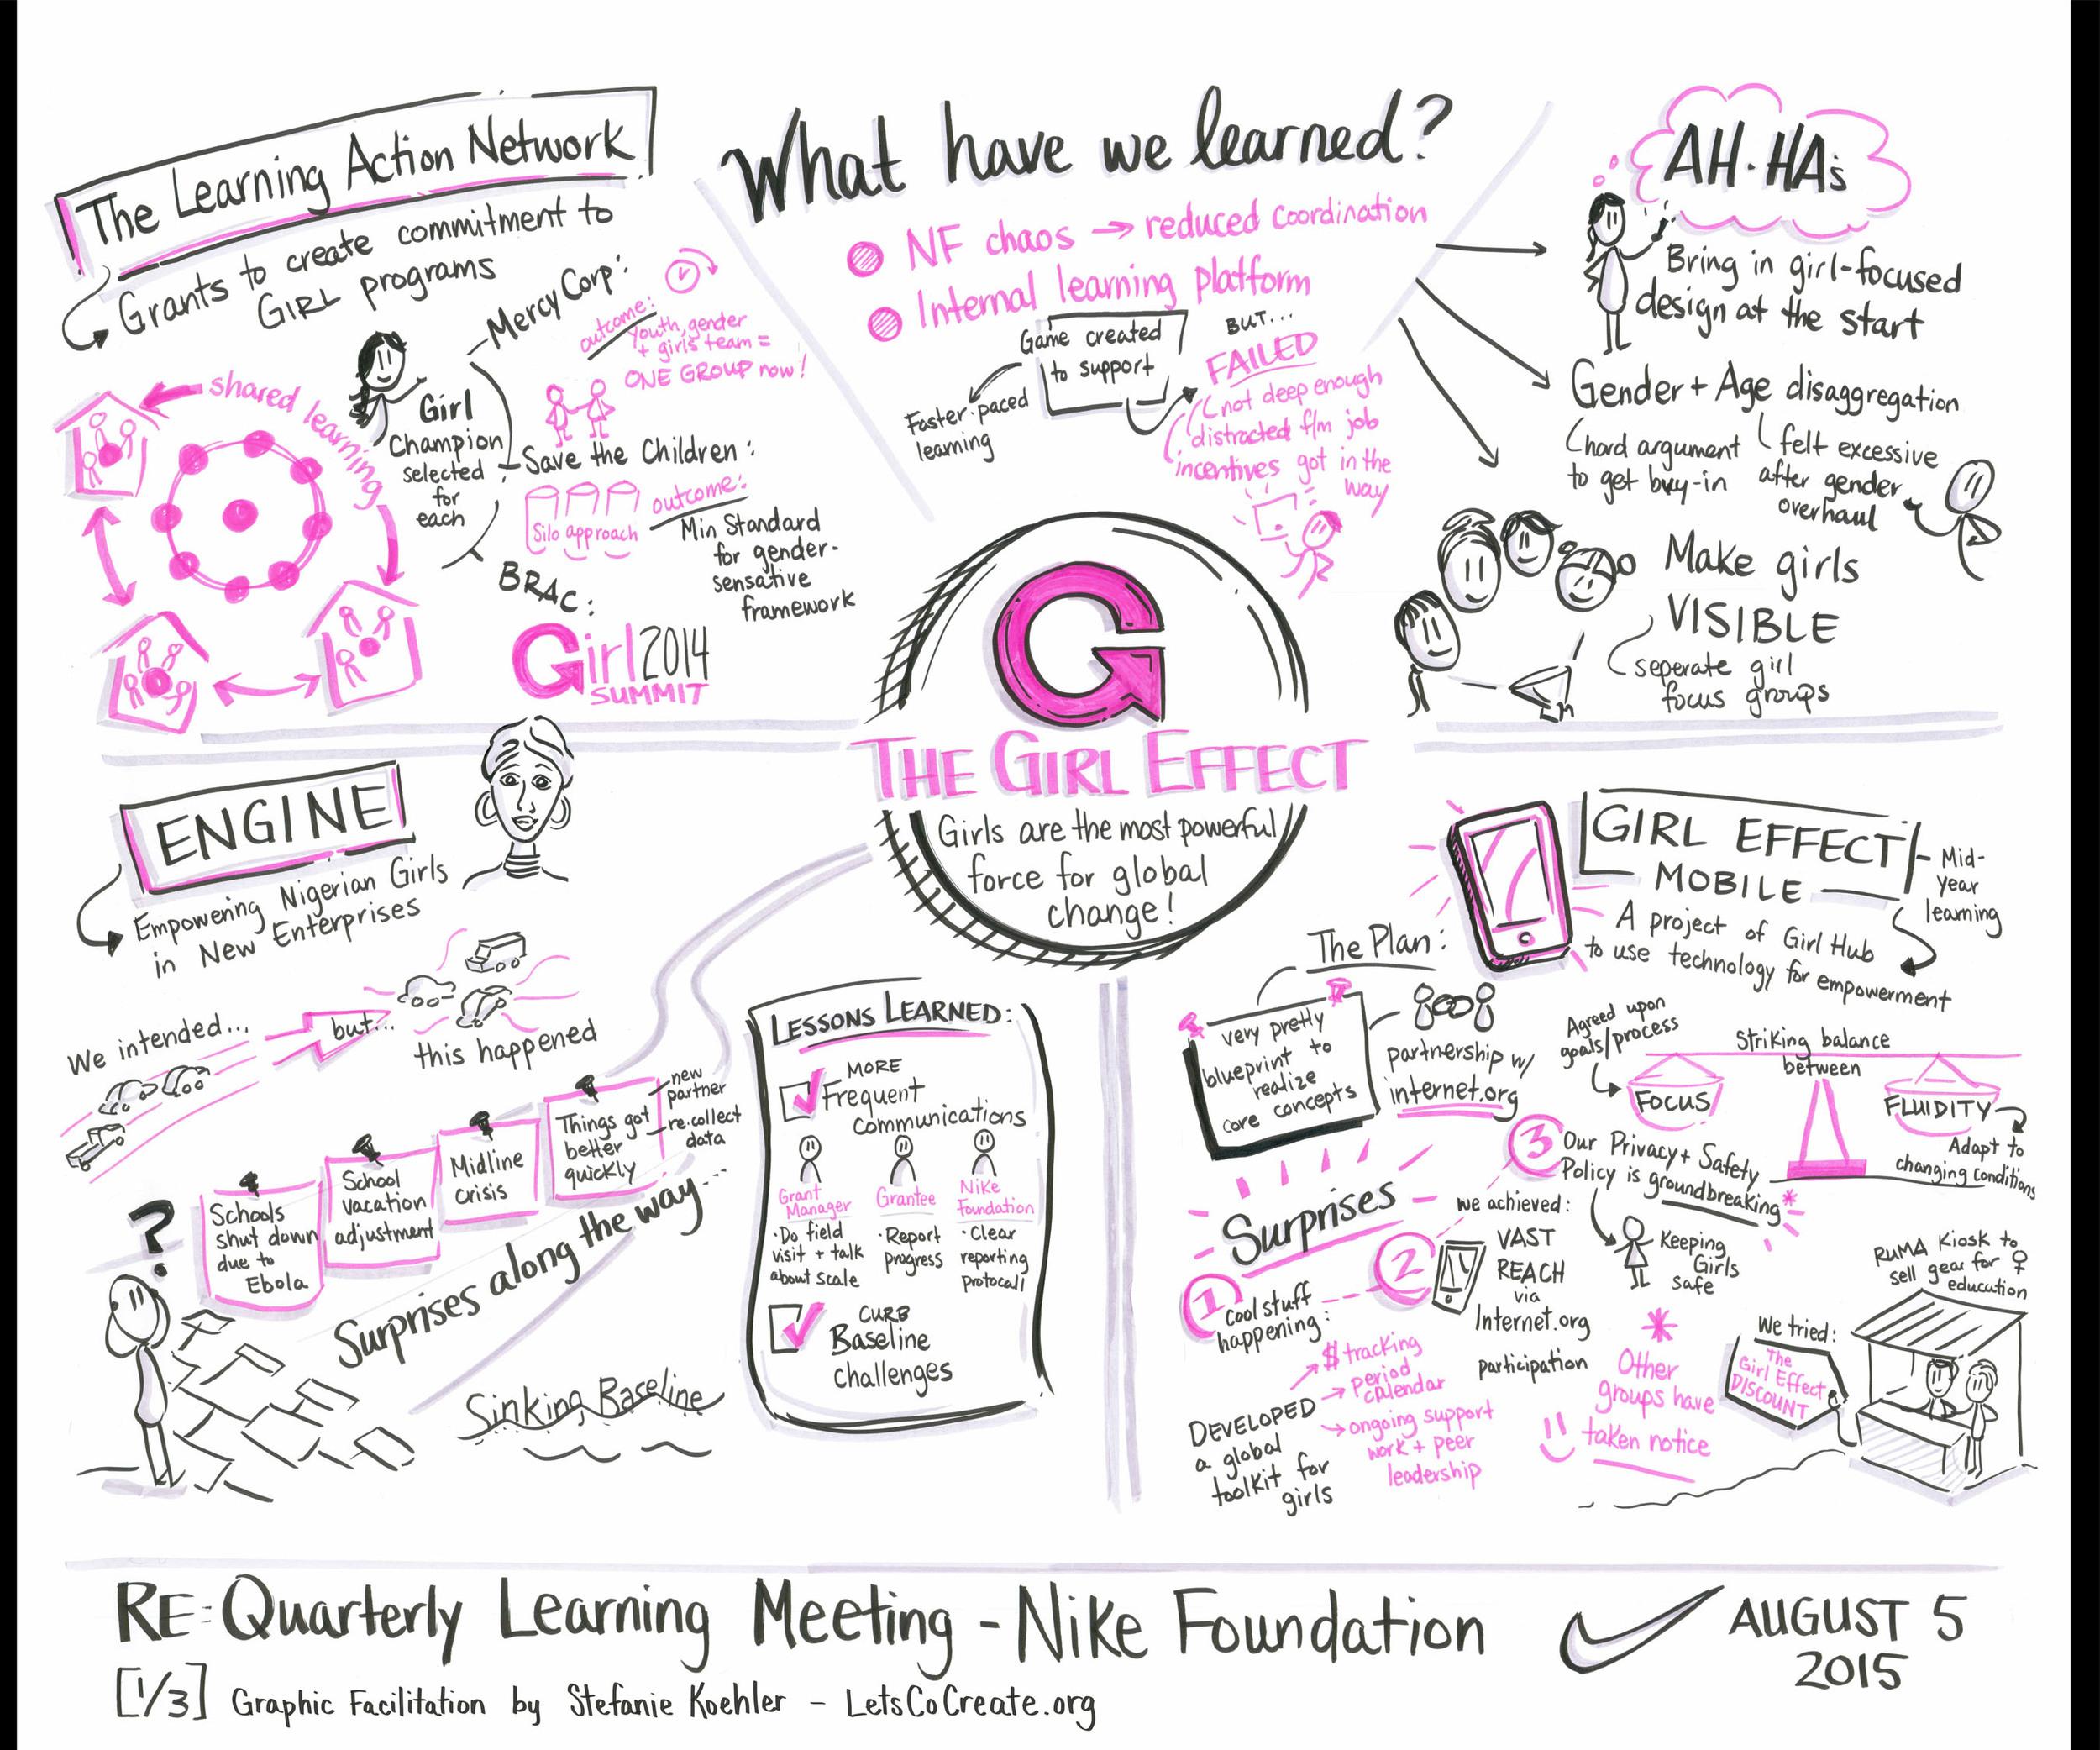 Nike Foundation's Quarterly Learning Retreat 2015